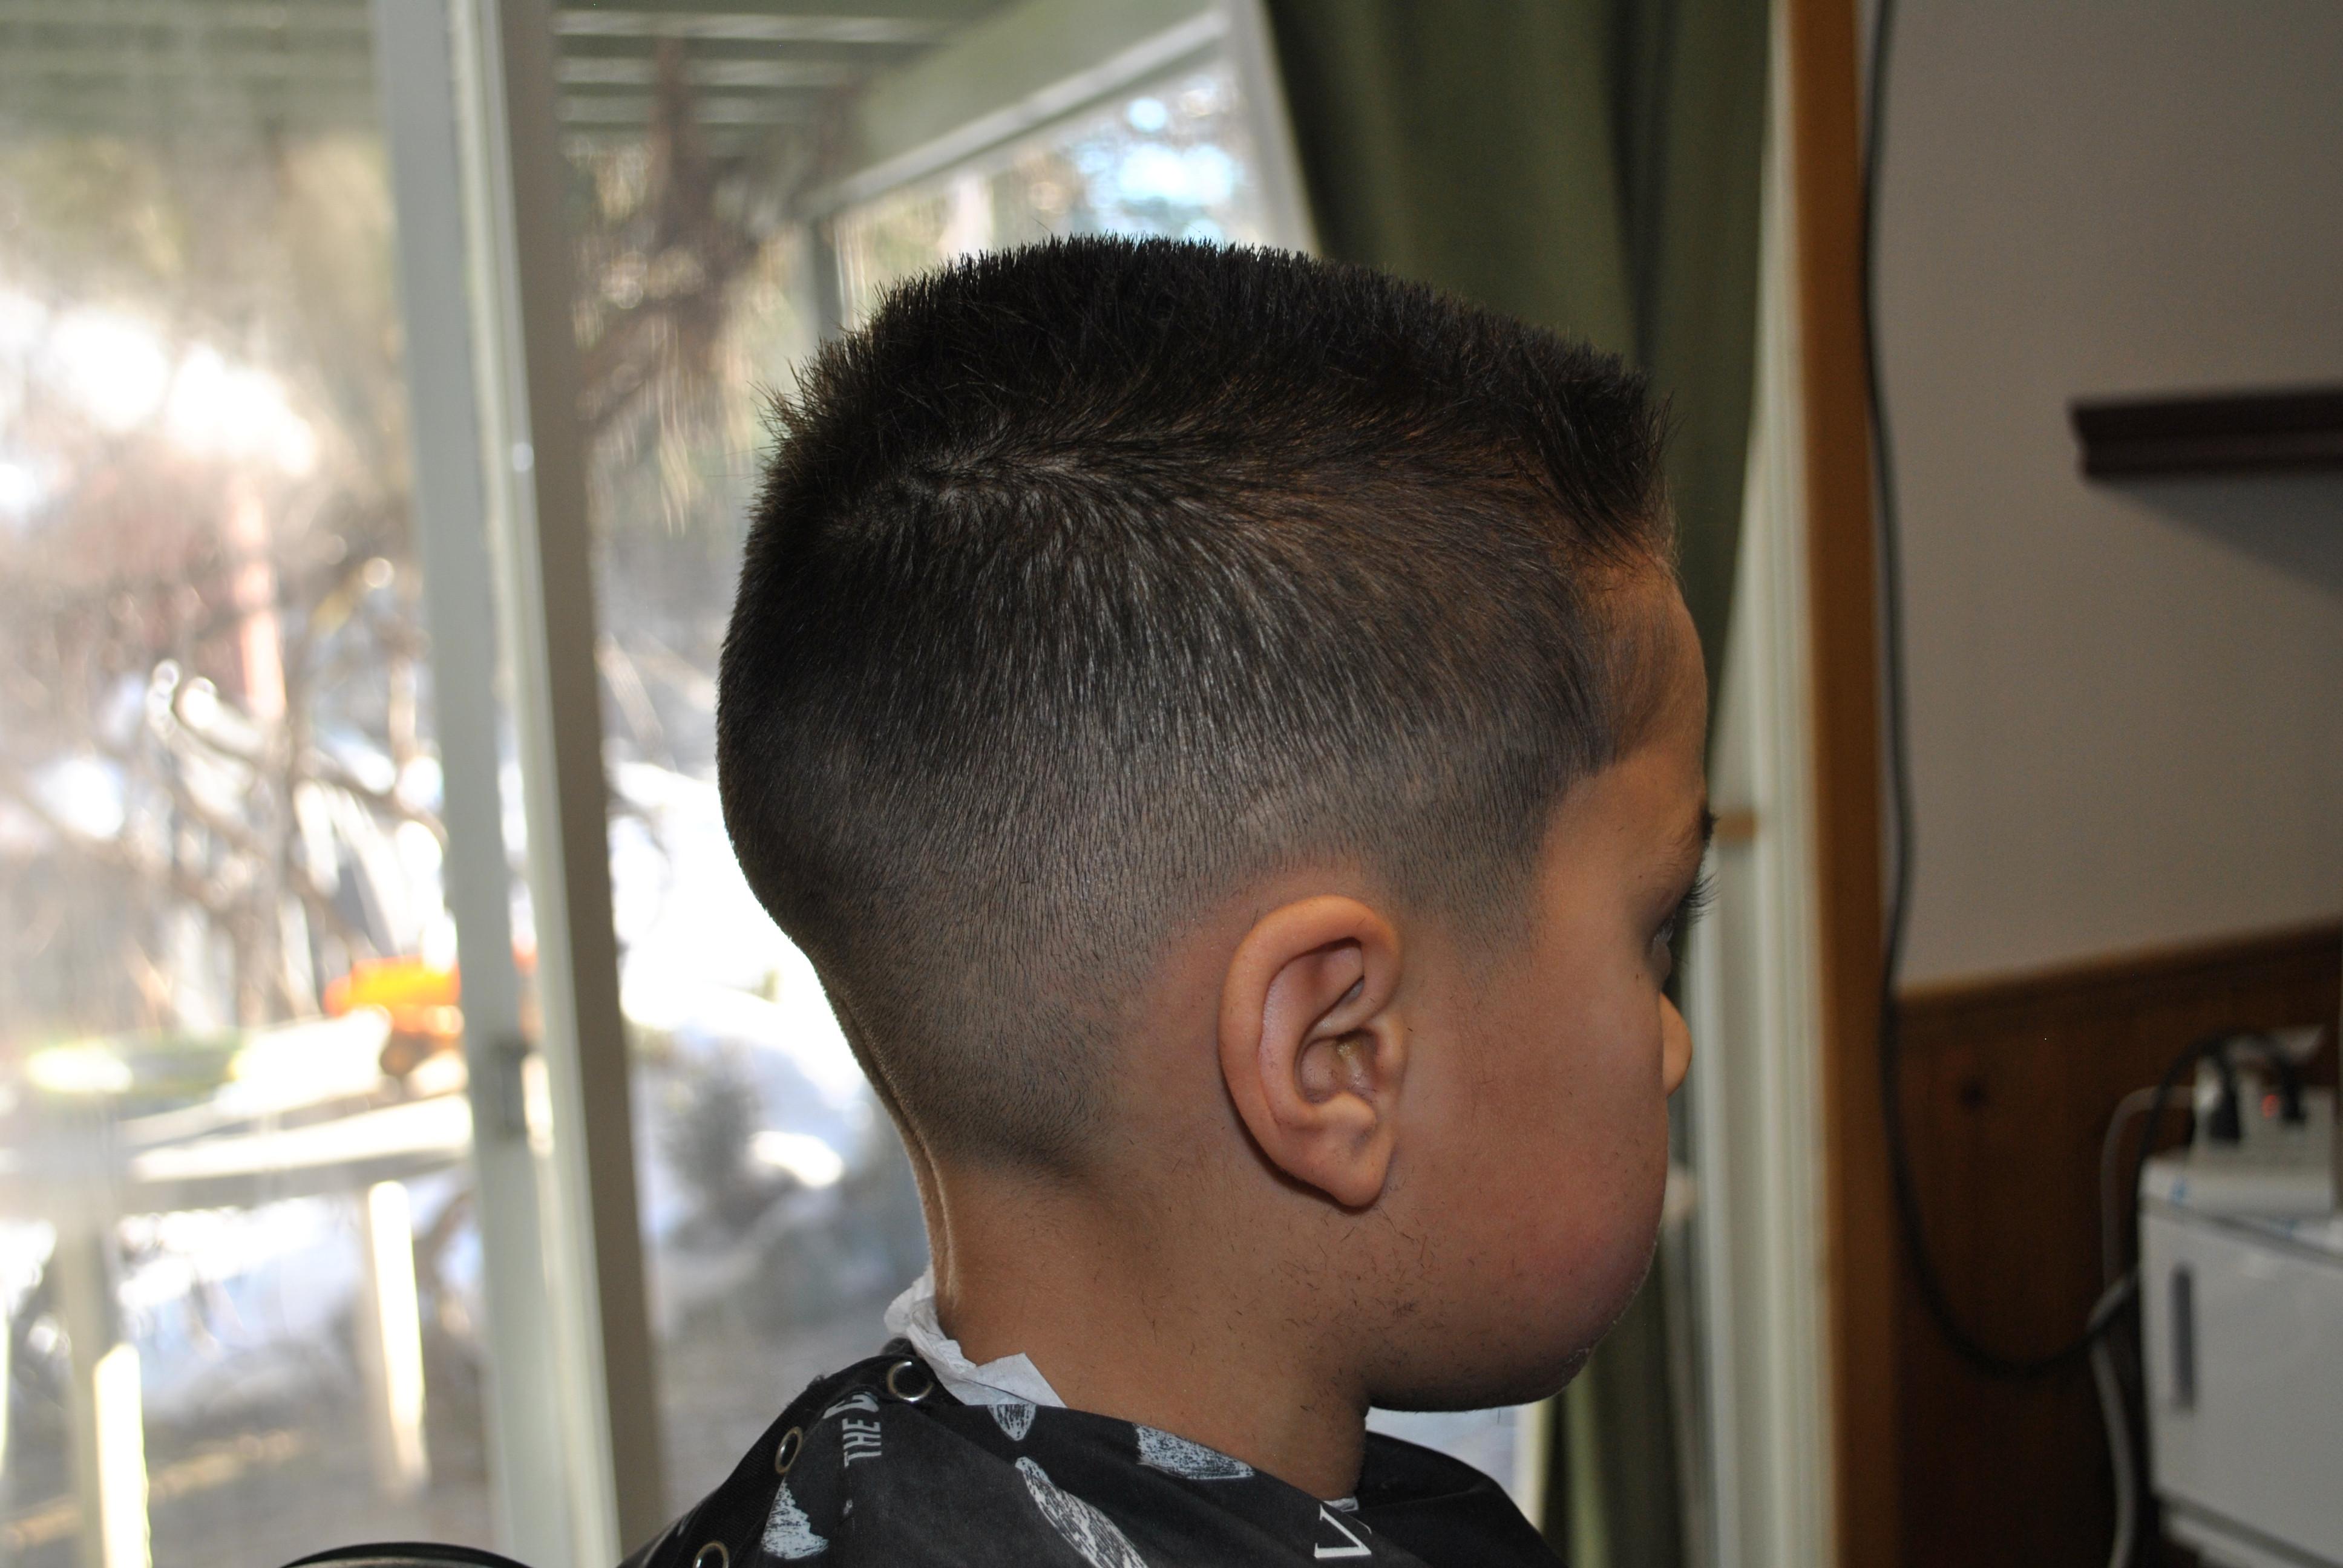 Kid's haircut